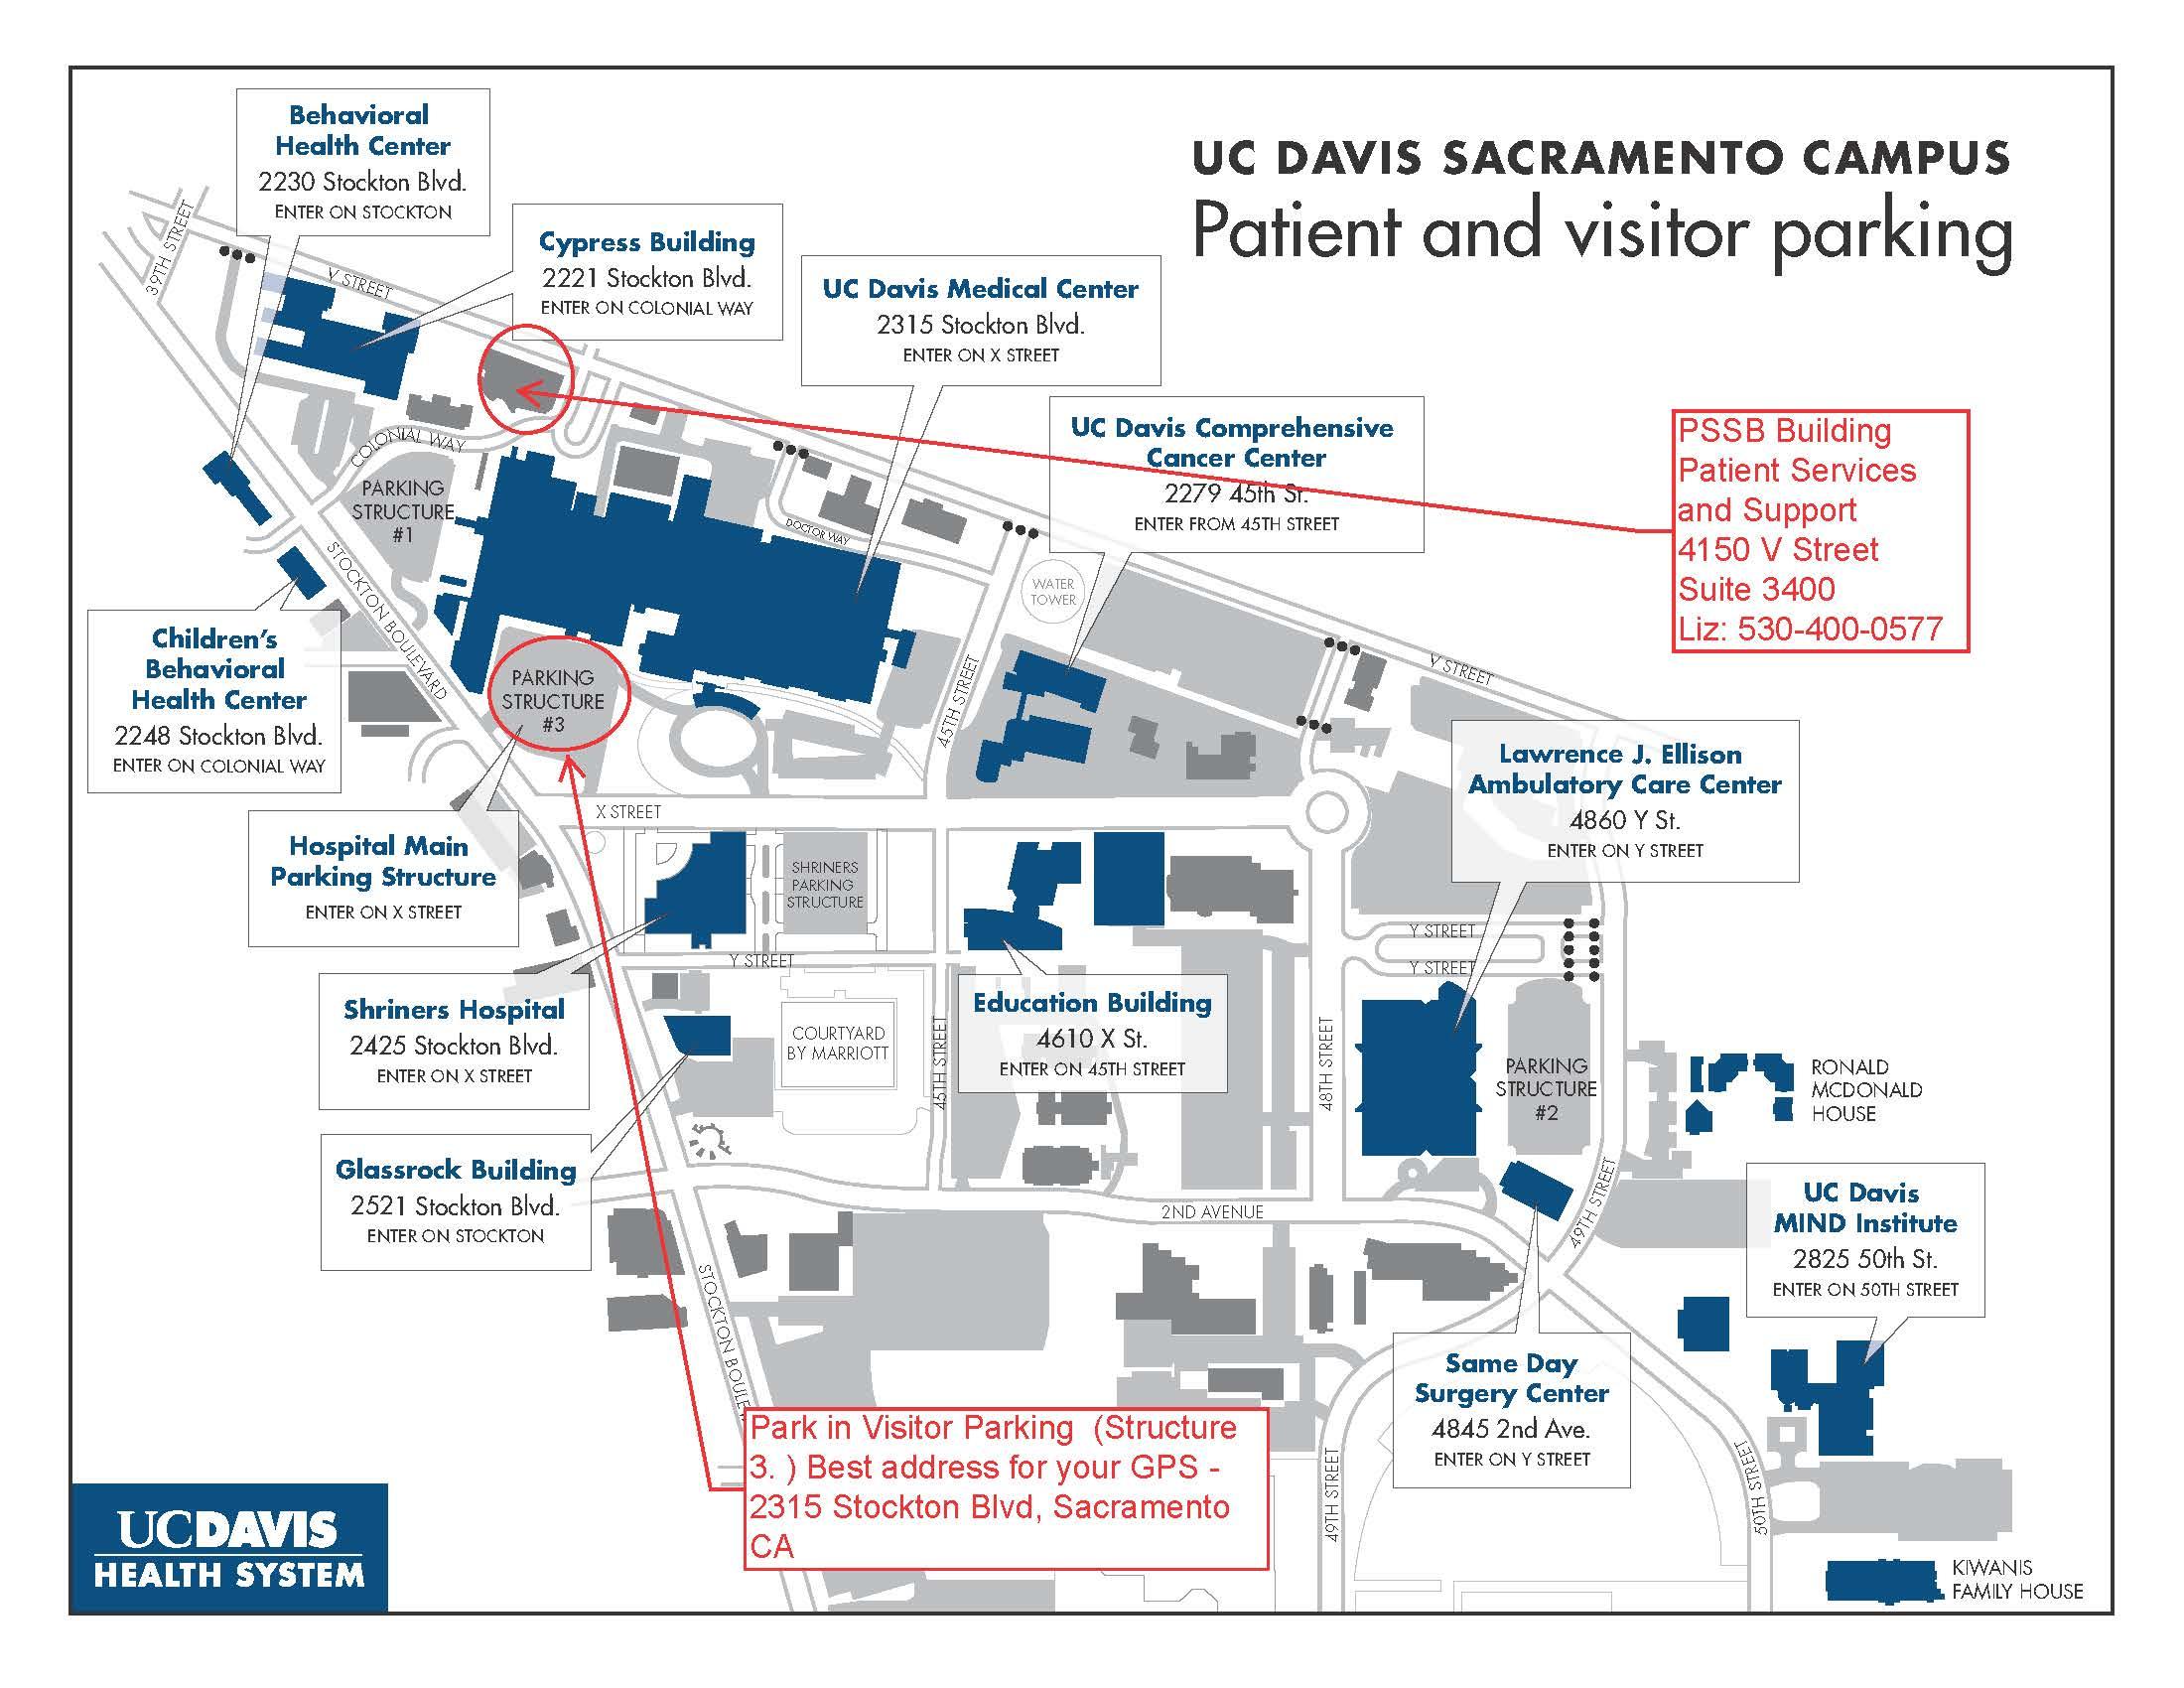 Ucdmc Map Pssc And Parking on Uc Davis Location